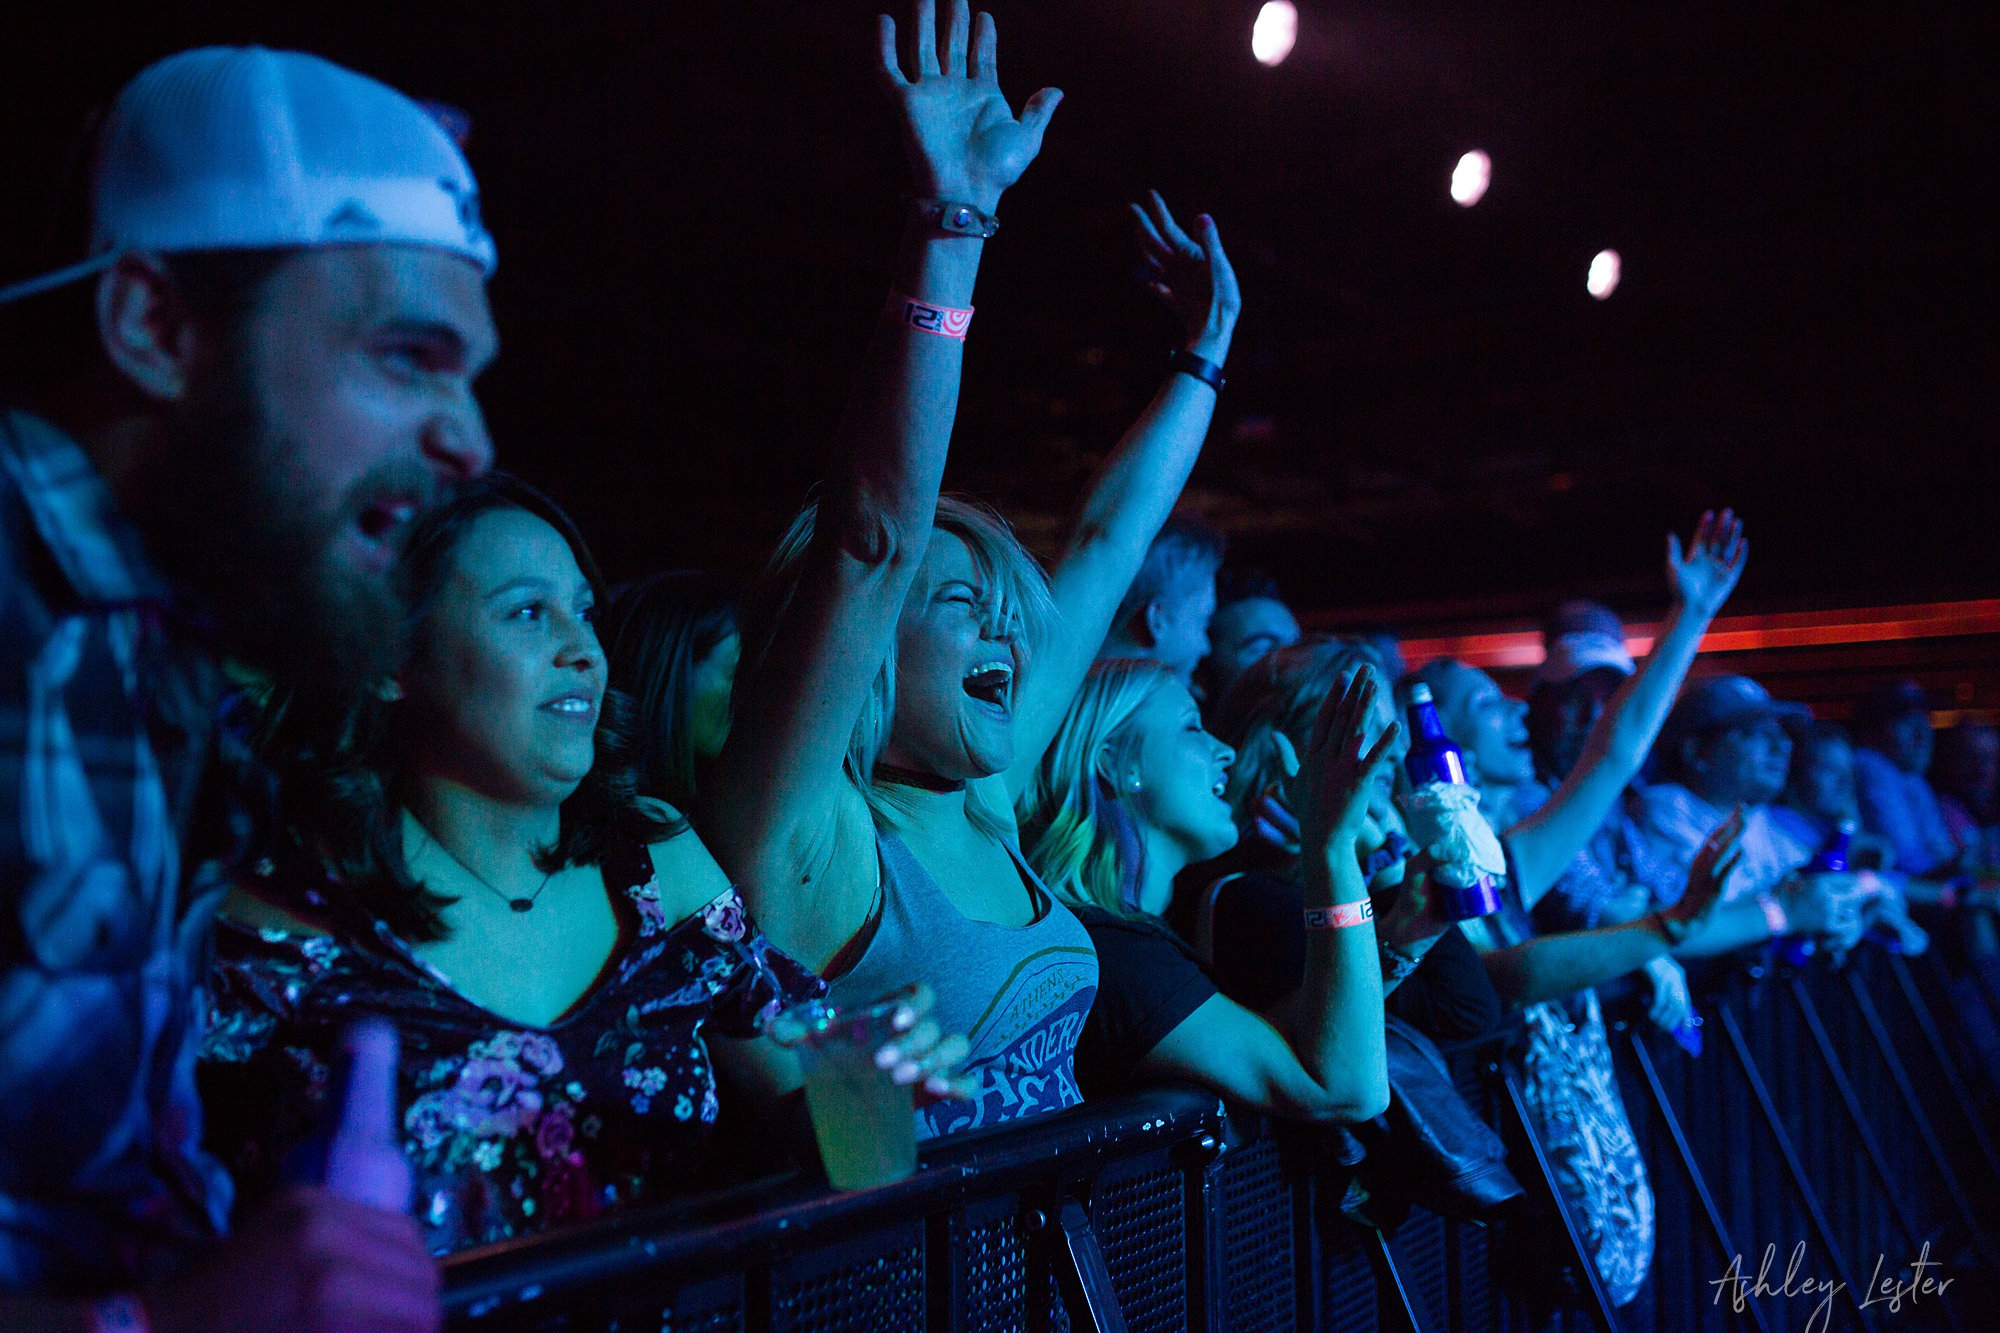 ConcertPhotographer-AndersonEast-AshleyLesterPhotography-CharlotteNC_0226.jpg